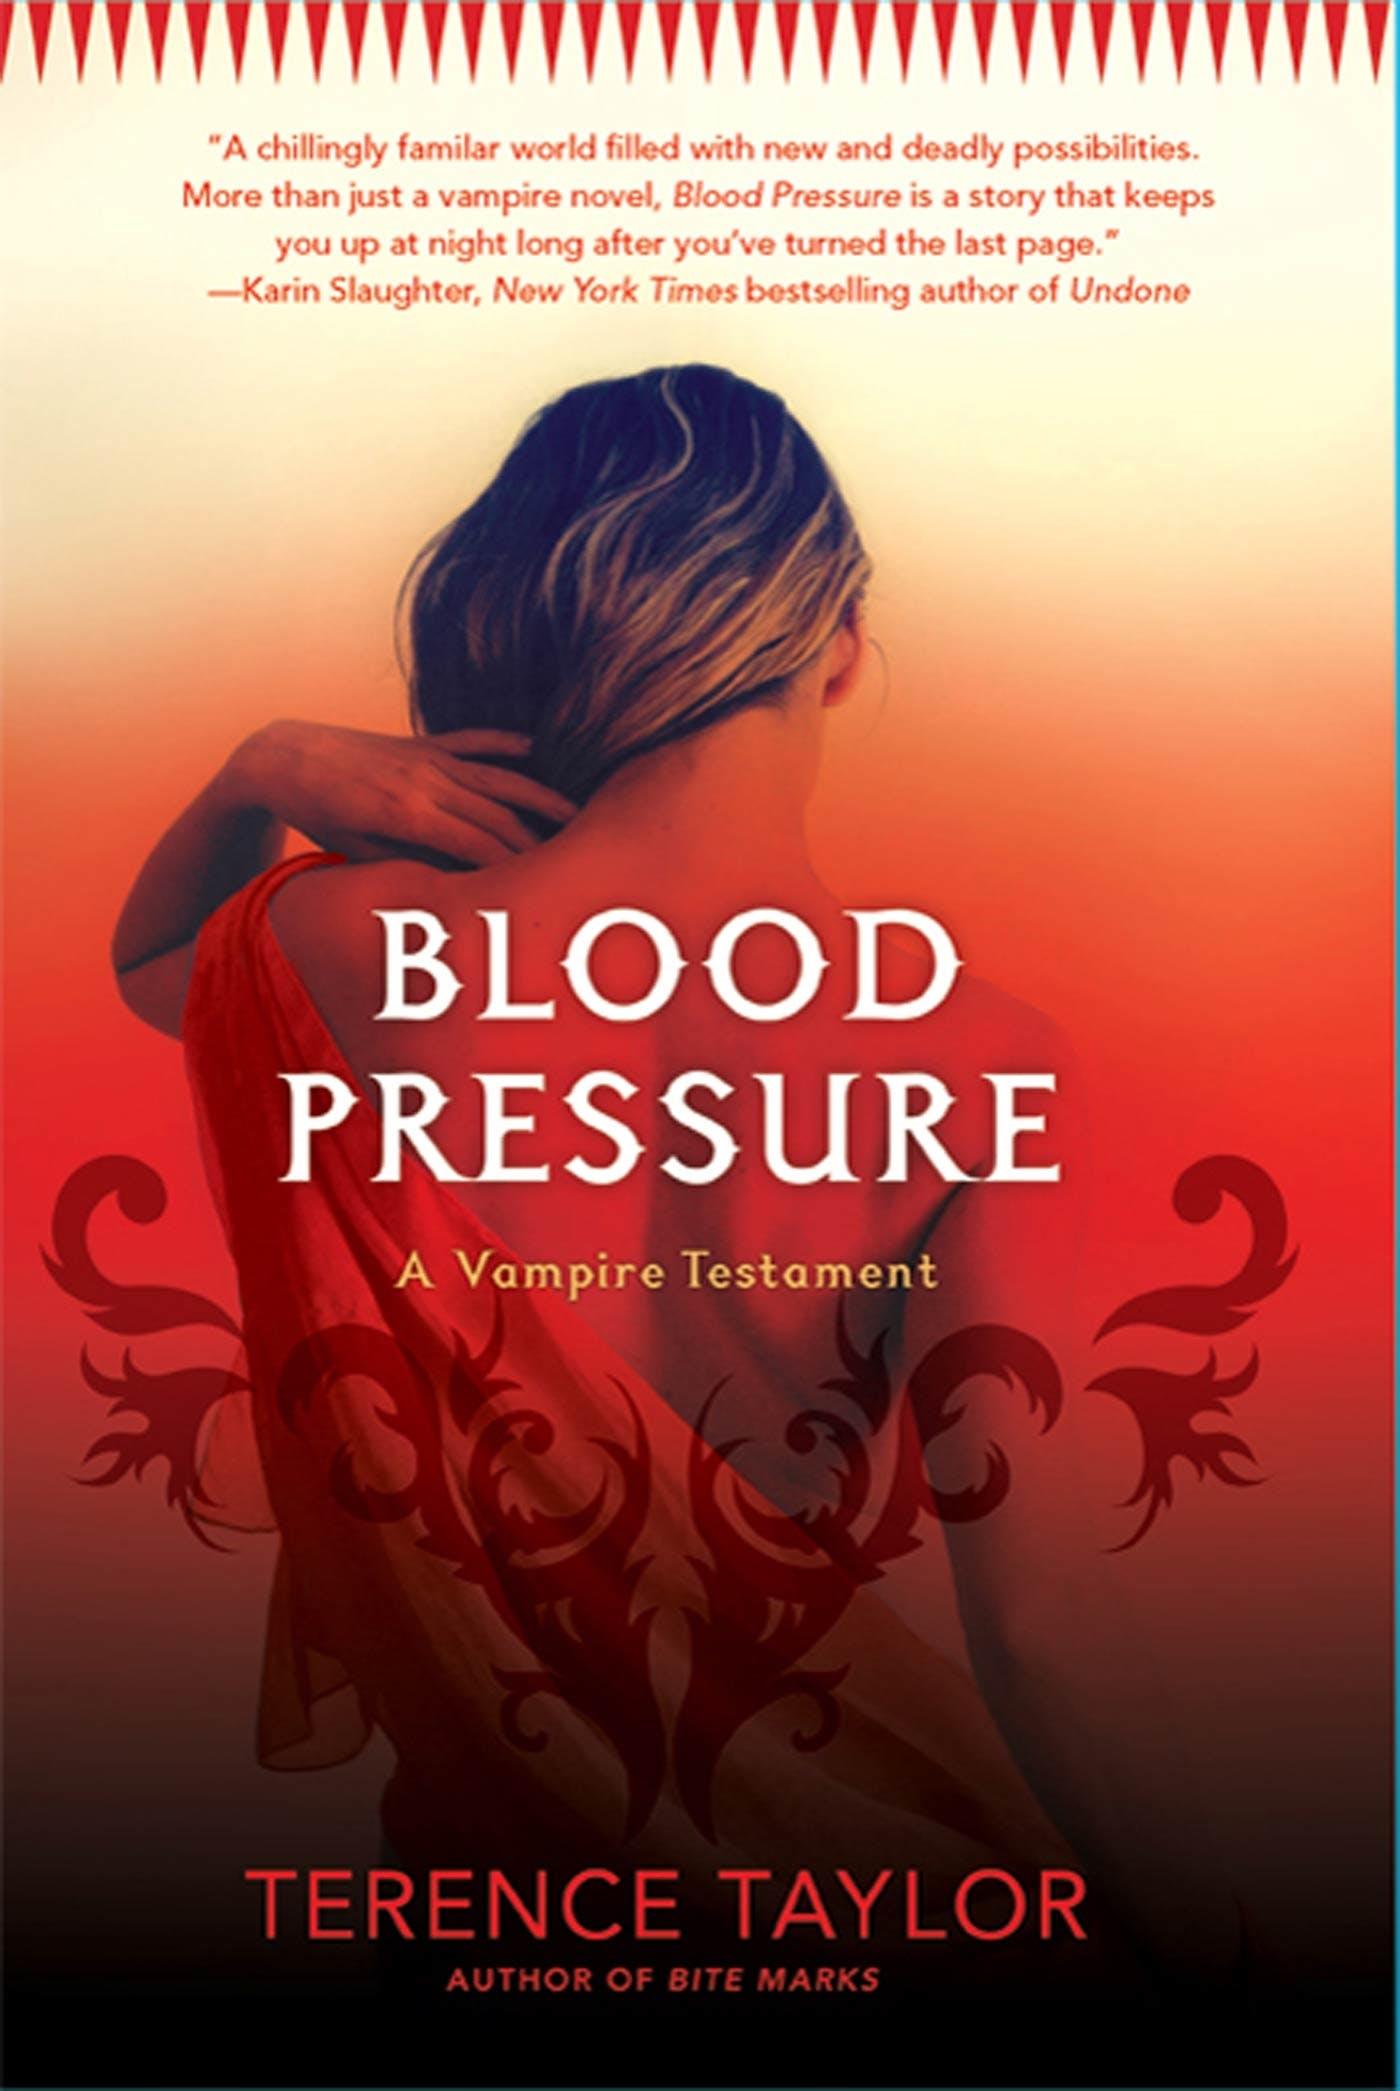 Image of Blood Pressure